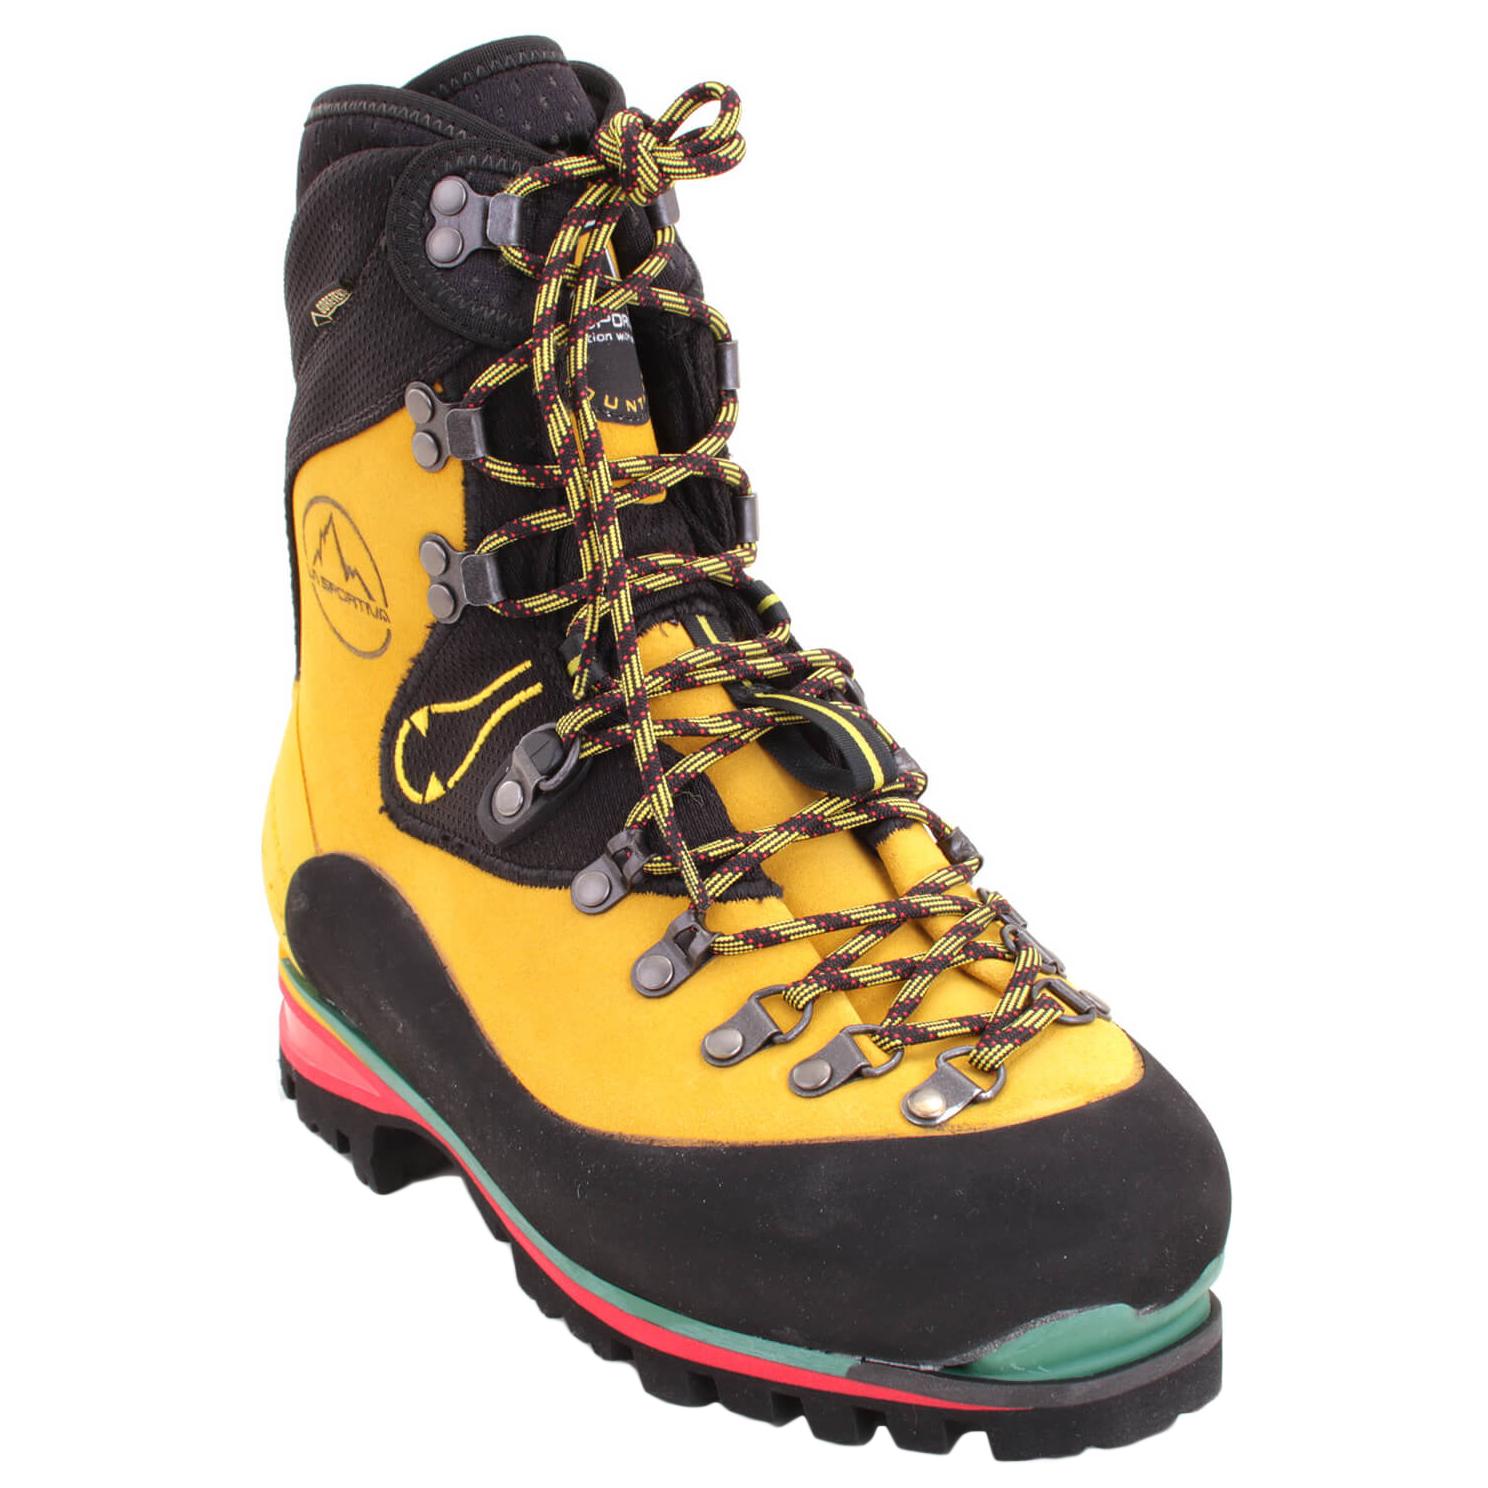 La Sportiva - Nepal Evo GTX - Bergschuhe Yellow